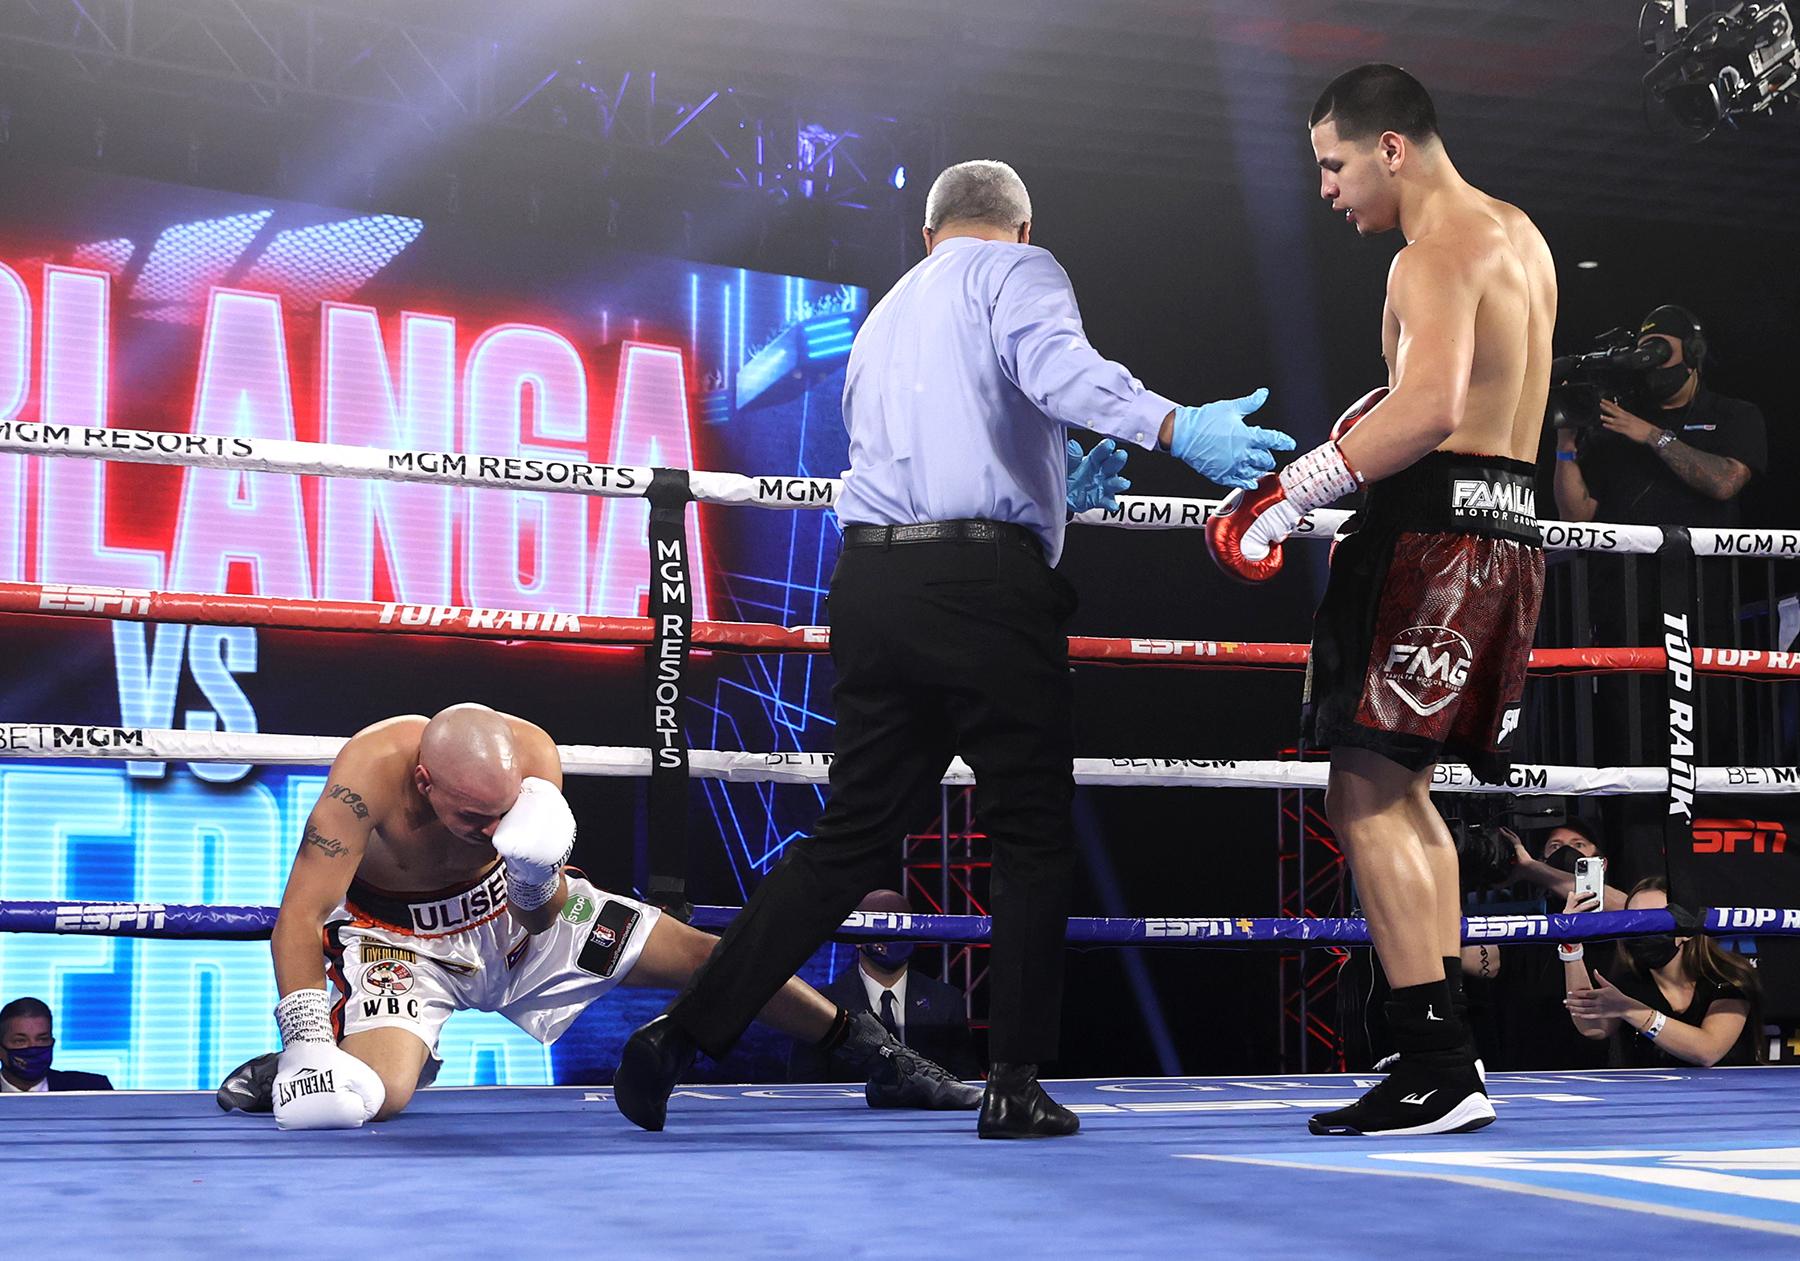 Edgar Berlanga drops Ulises Sierra 3 times, runs first round KO streak to  16 straight - The Ring